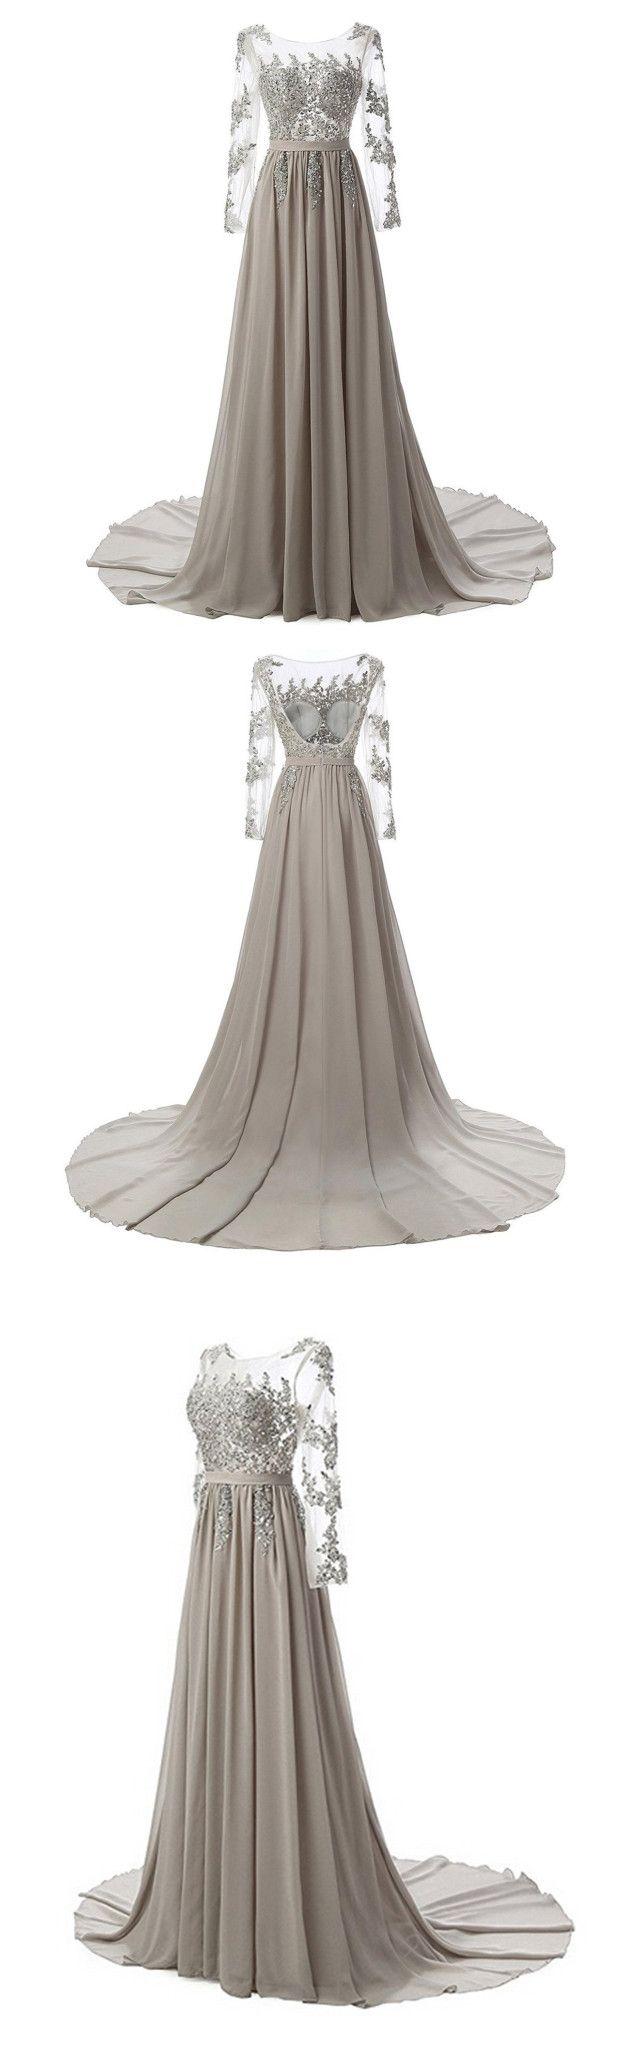 Womenus new long evening dresses chiffon lace fashion gown